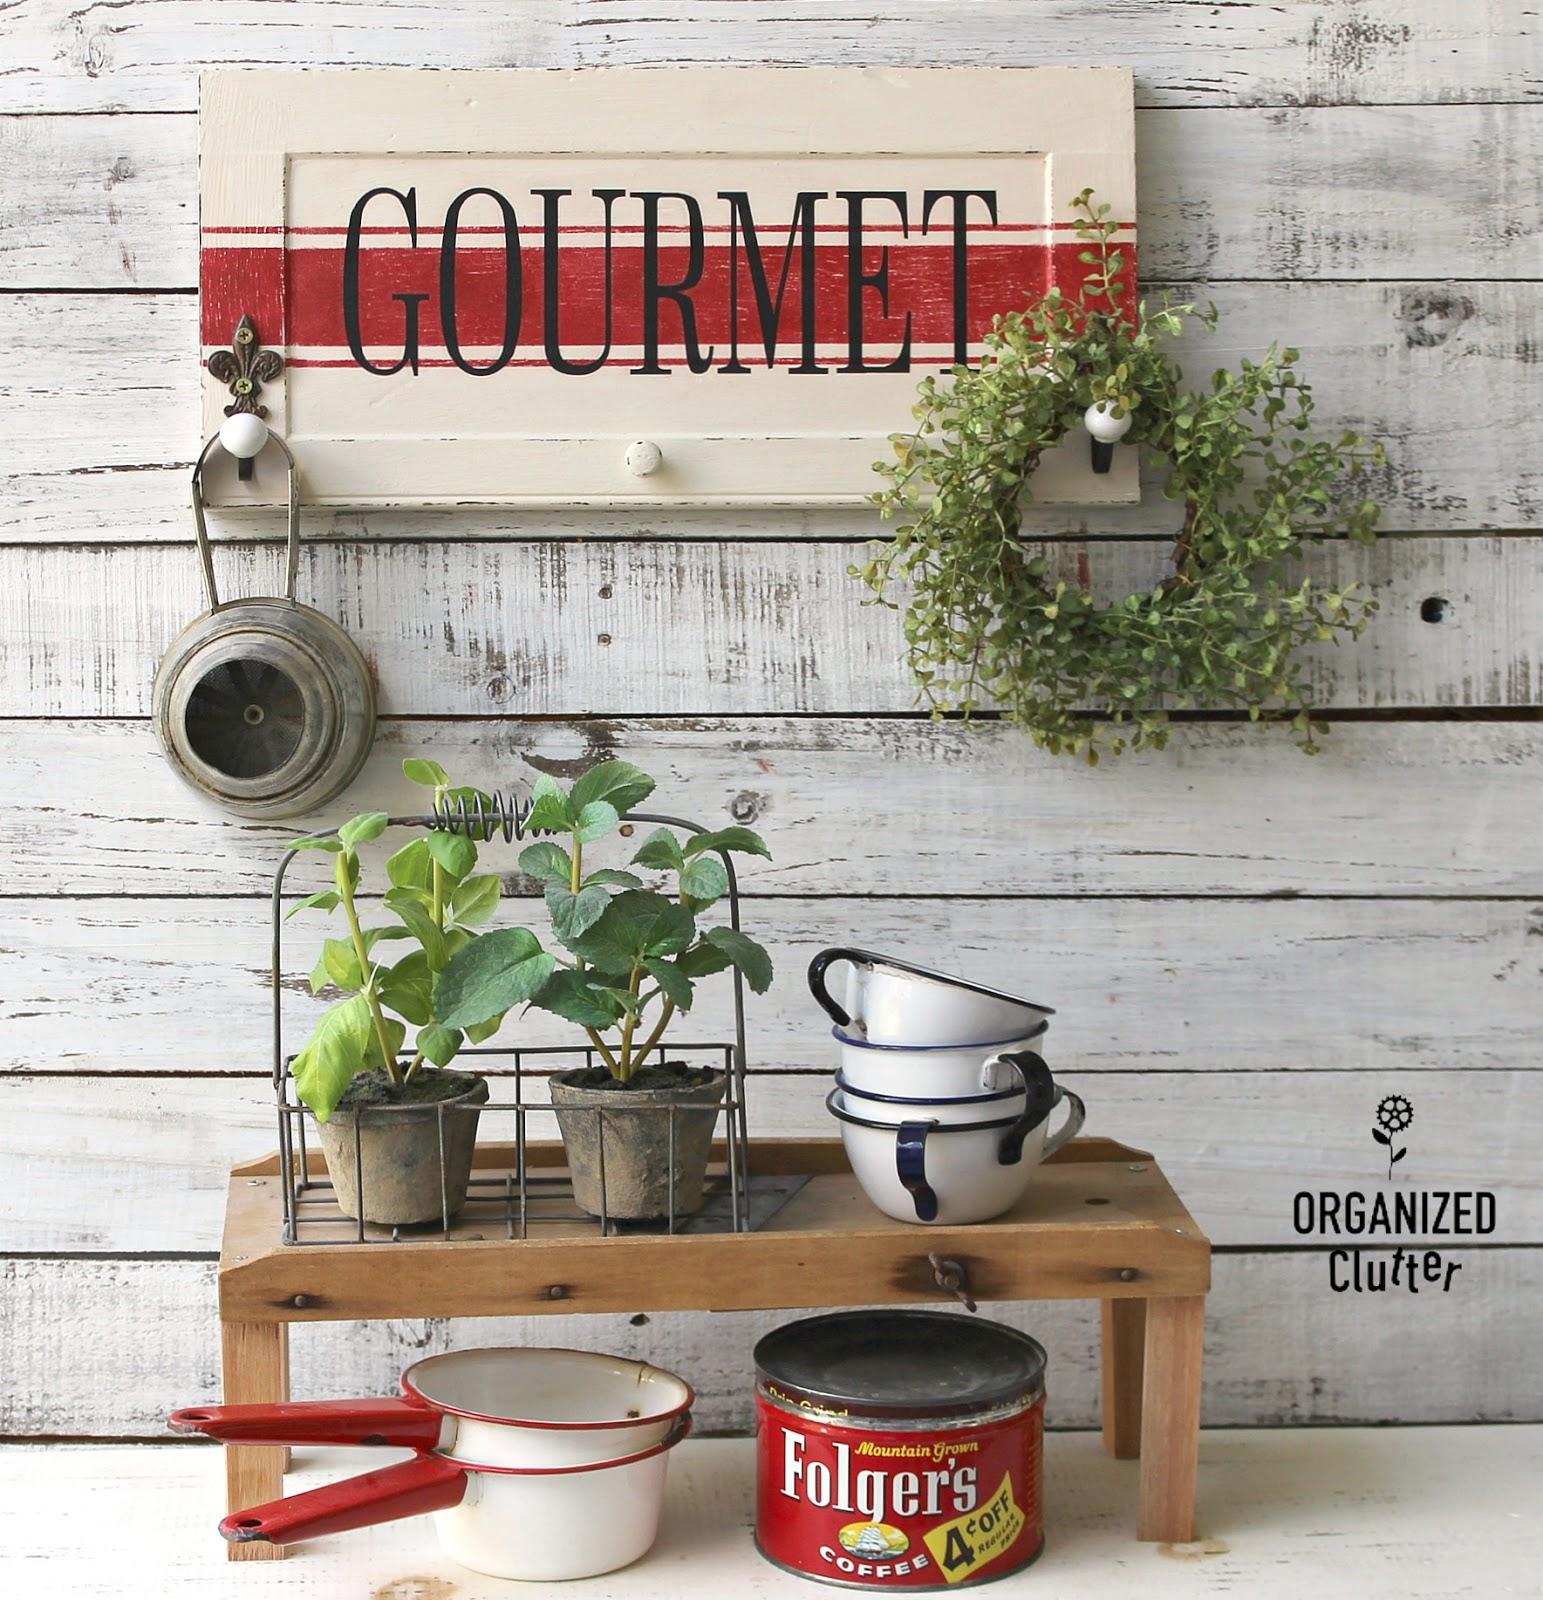 Gourmet Kitchen Cabinets: Garage Sale Cabinet Door Gourmet Kitchen Sign/Wall Hooks